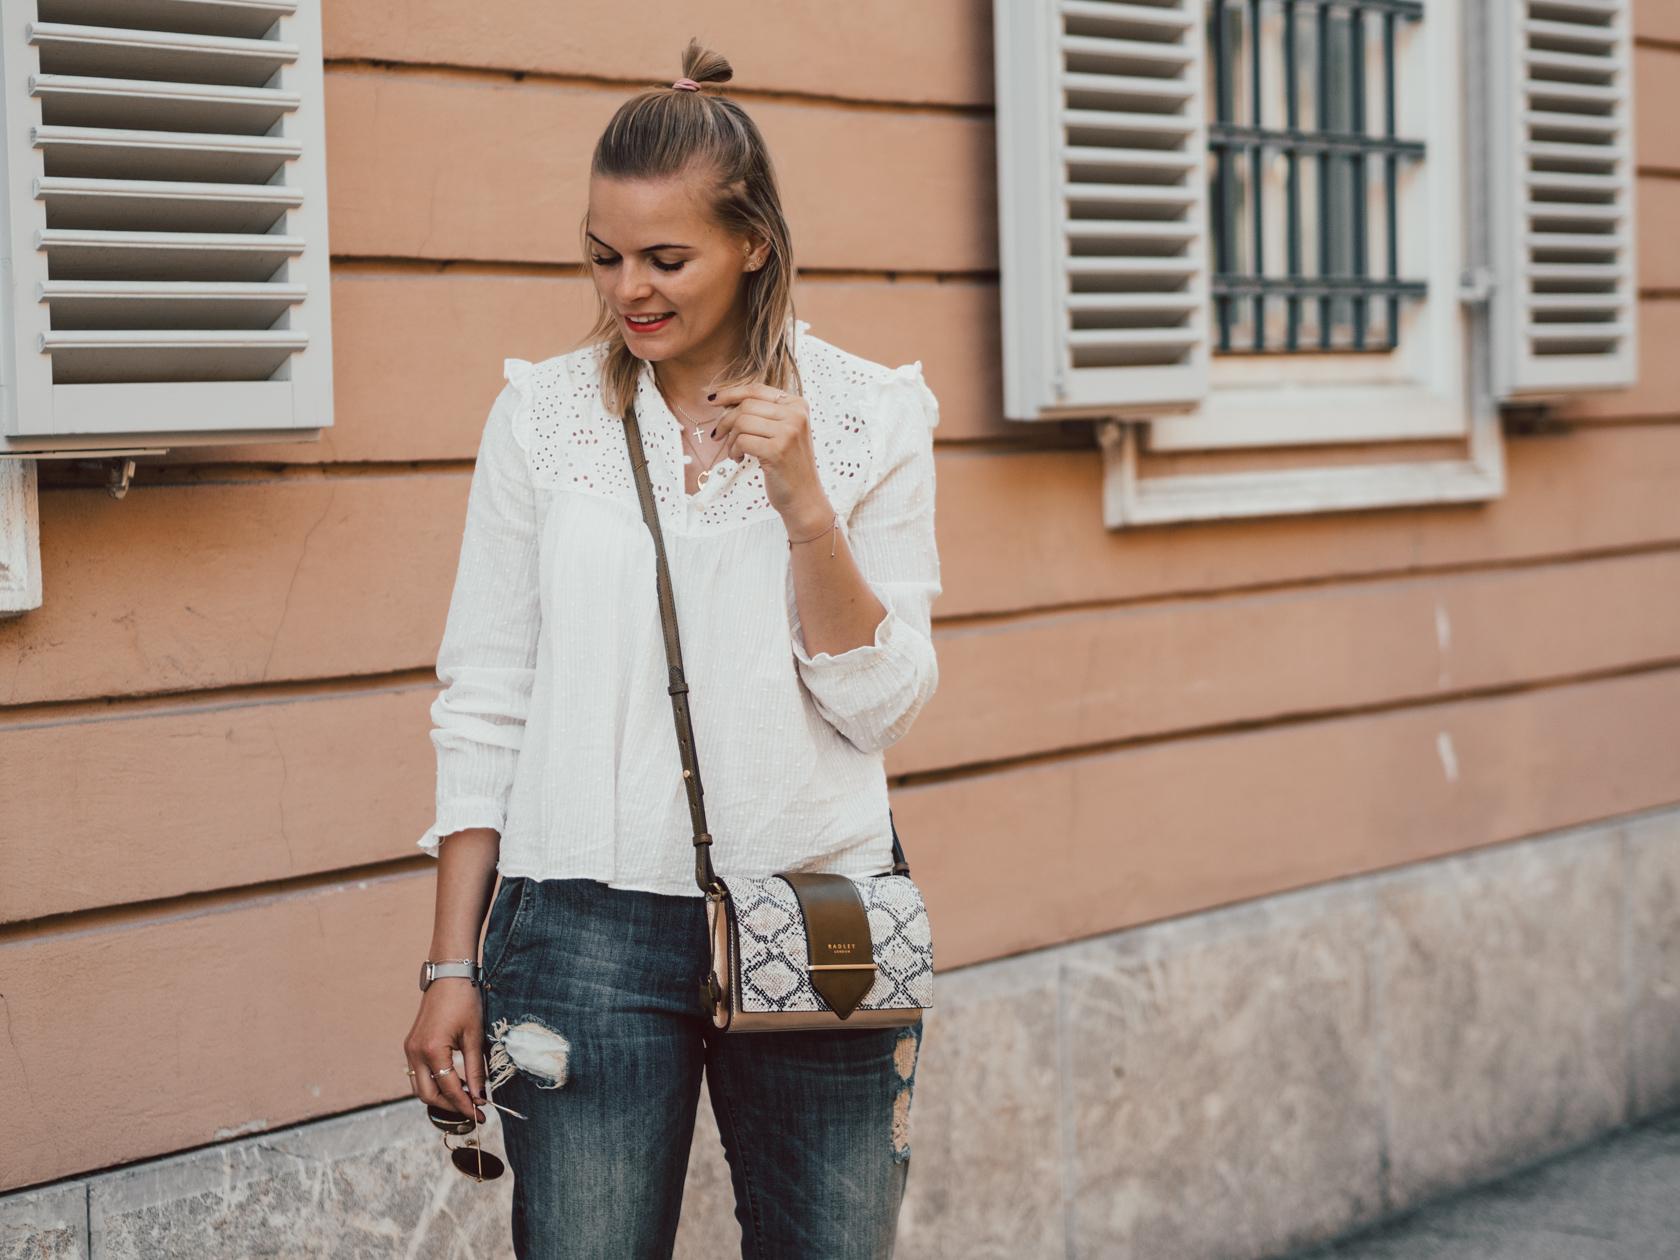 Boyfriend Jeans kombinieren, spitzentop, bluse kombinieren, streetlook, jeanshose kombinieren, fashionblogger, converse,